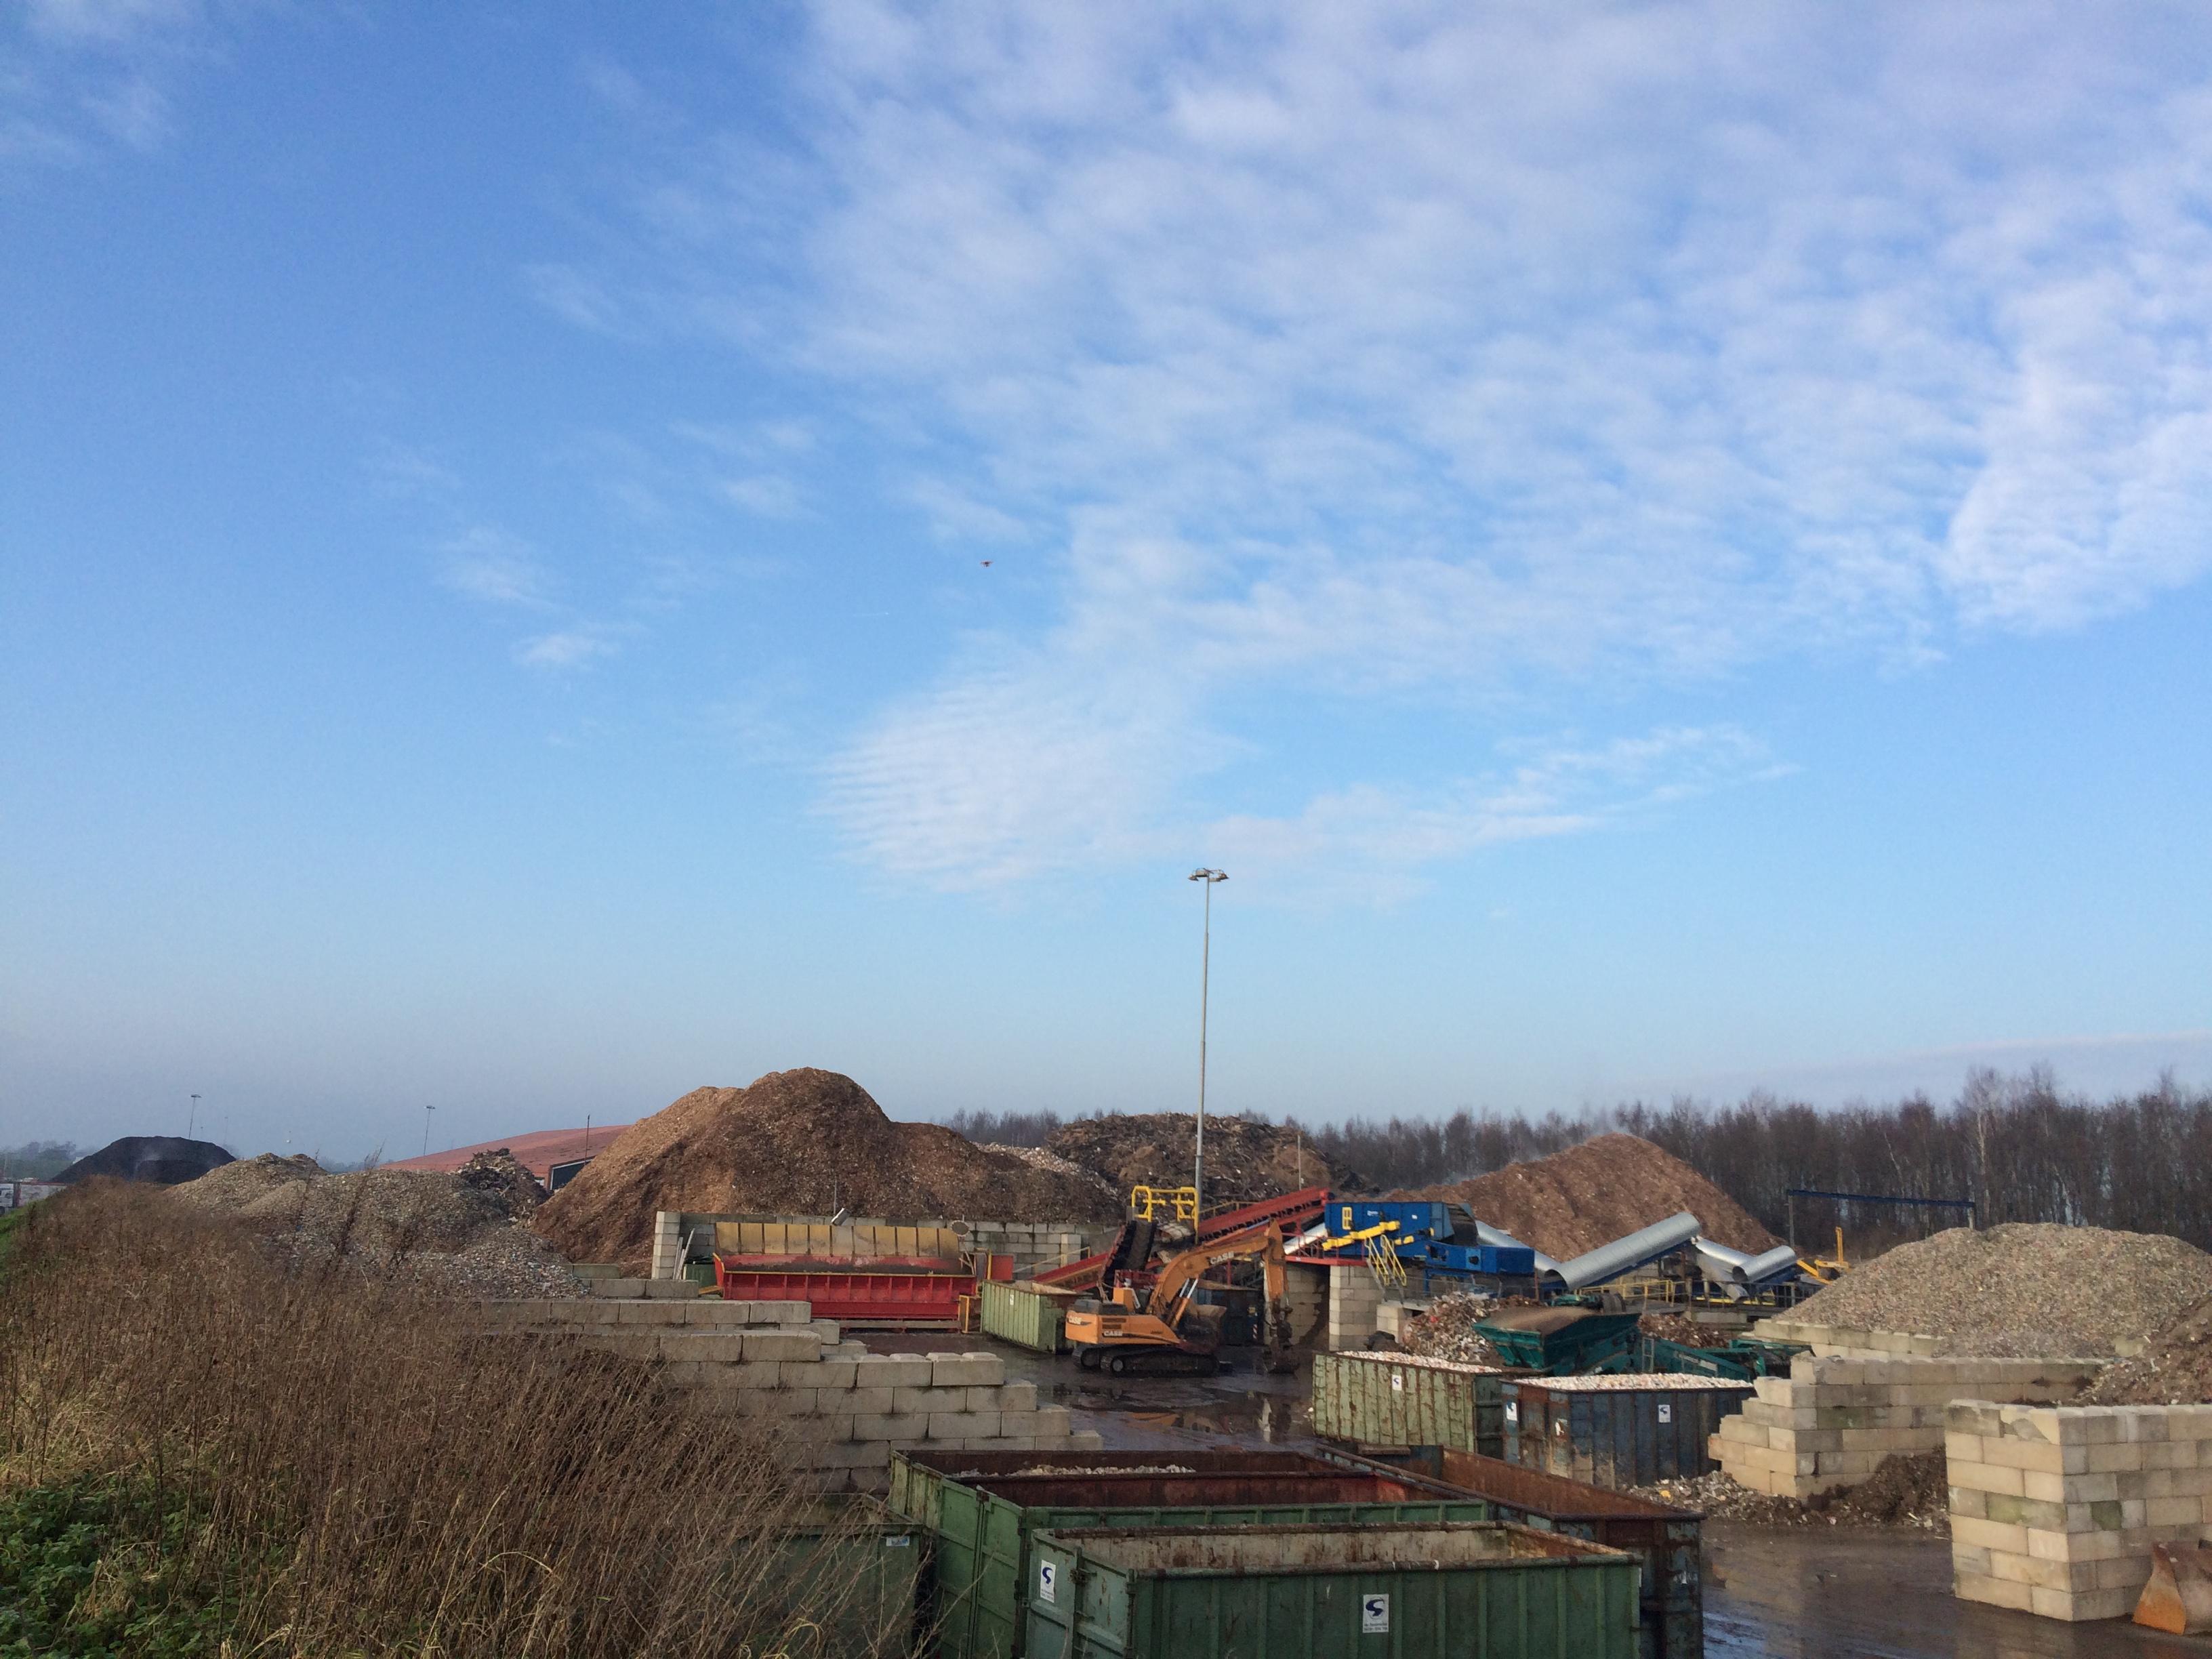 Circulair Economy plant Van Gansewinkel at Drachten